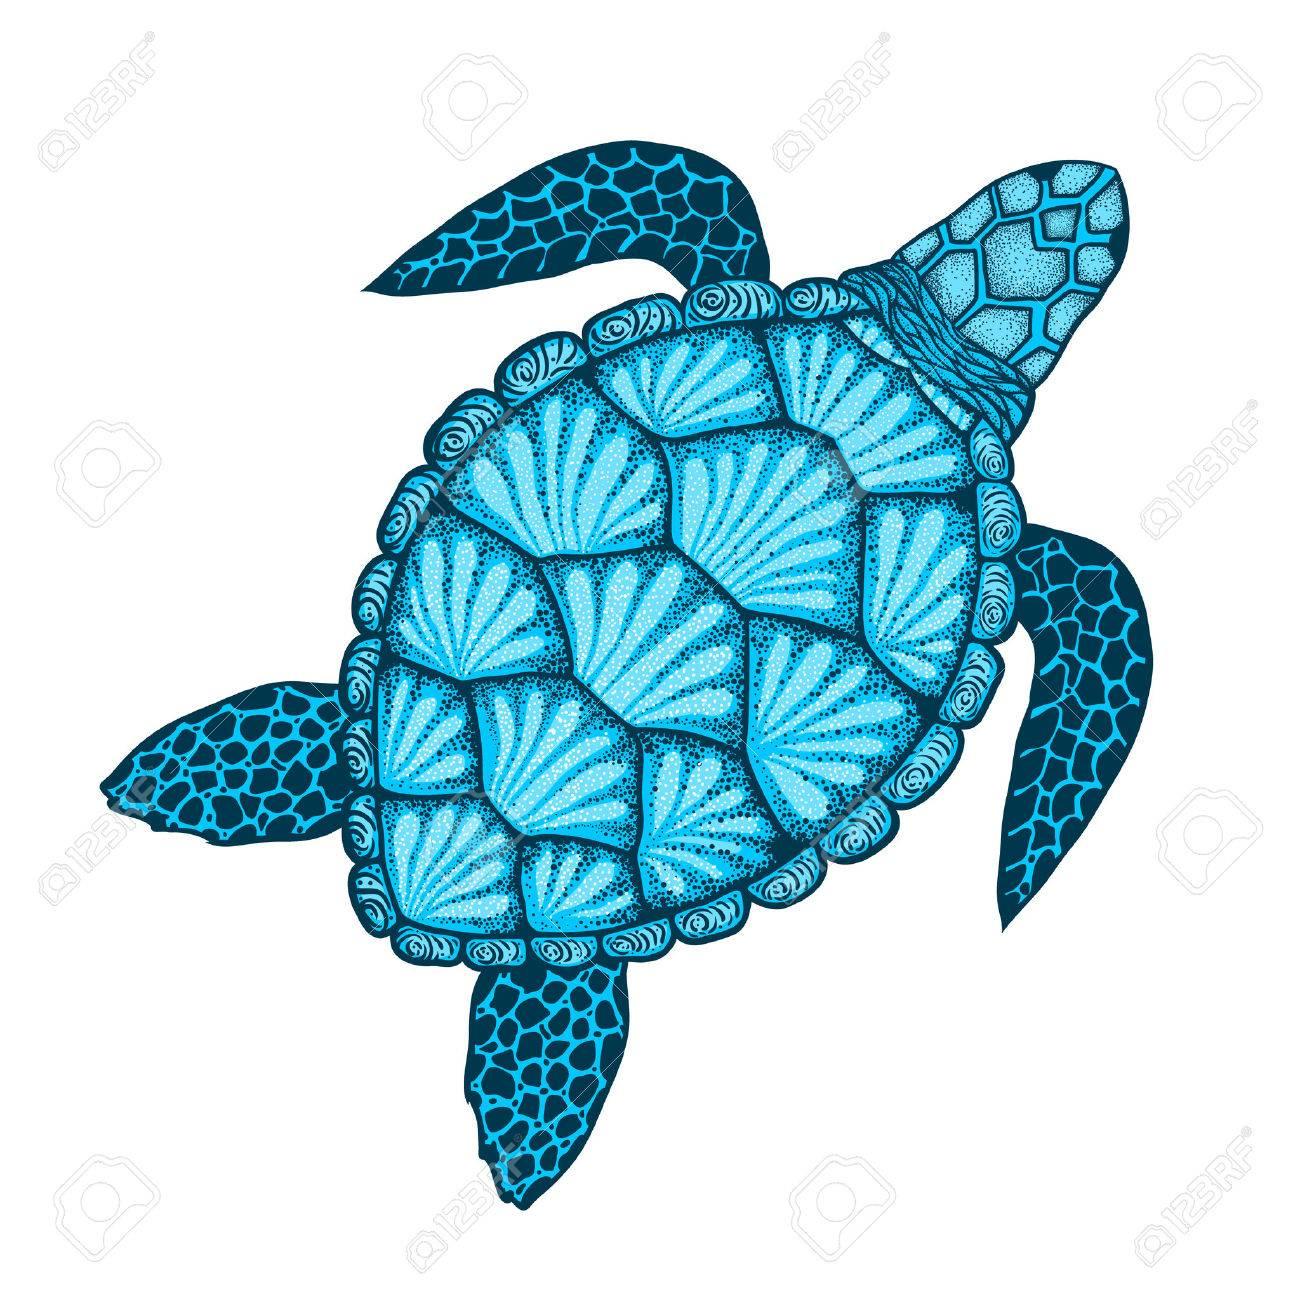 Sea Turtle In Line Art Style Hand Drawn Vector Illustration